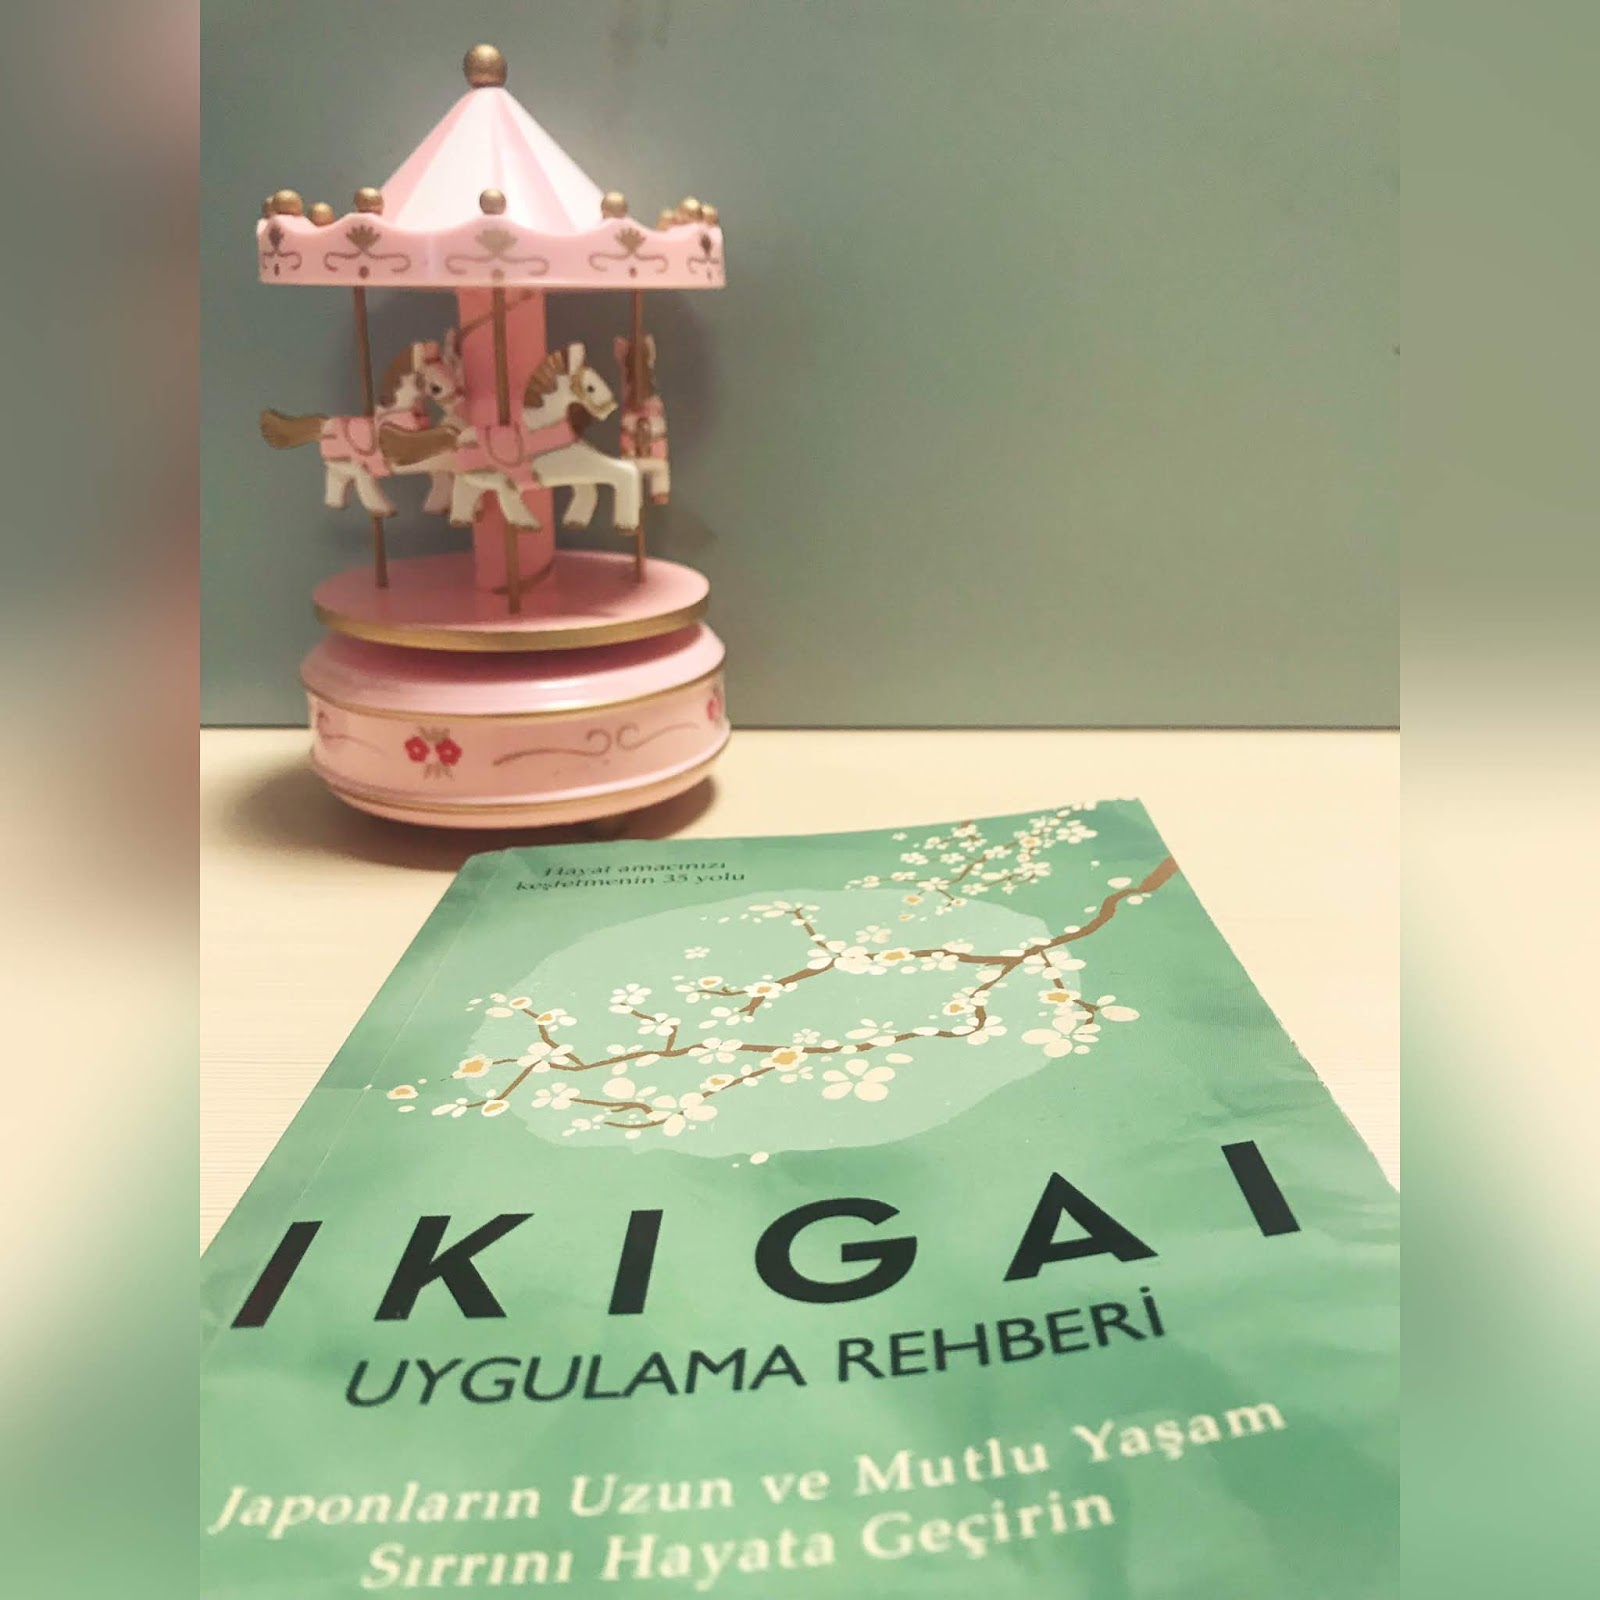 IKIGAI - Uygulama Rehberi